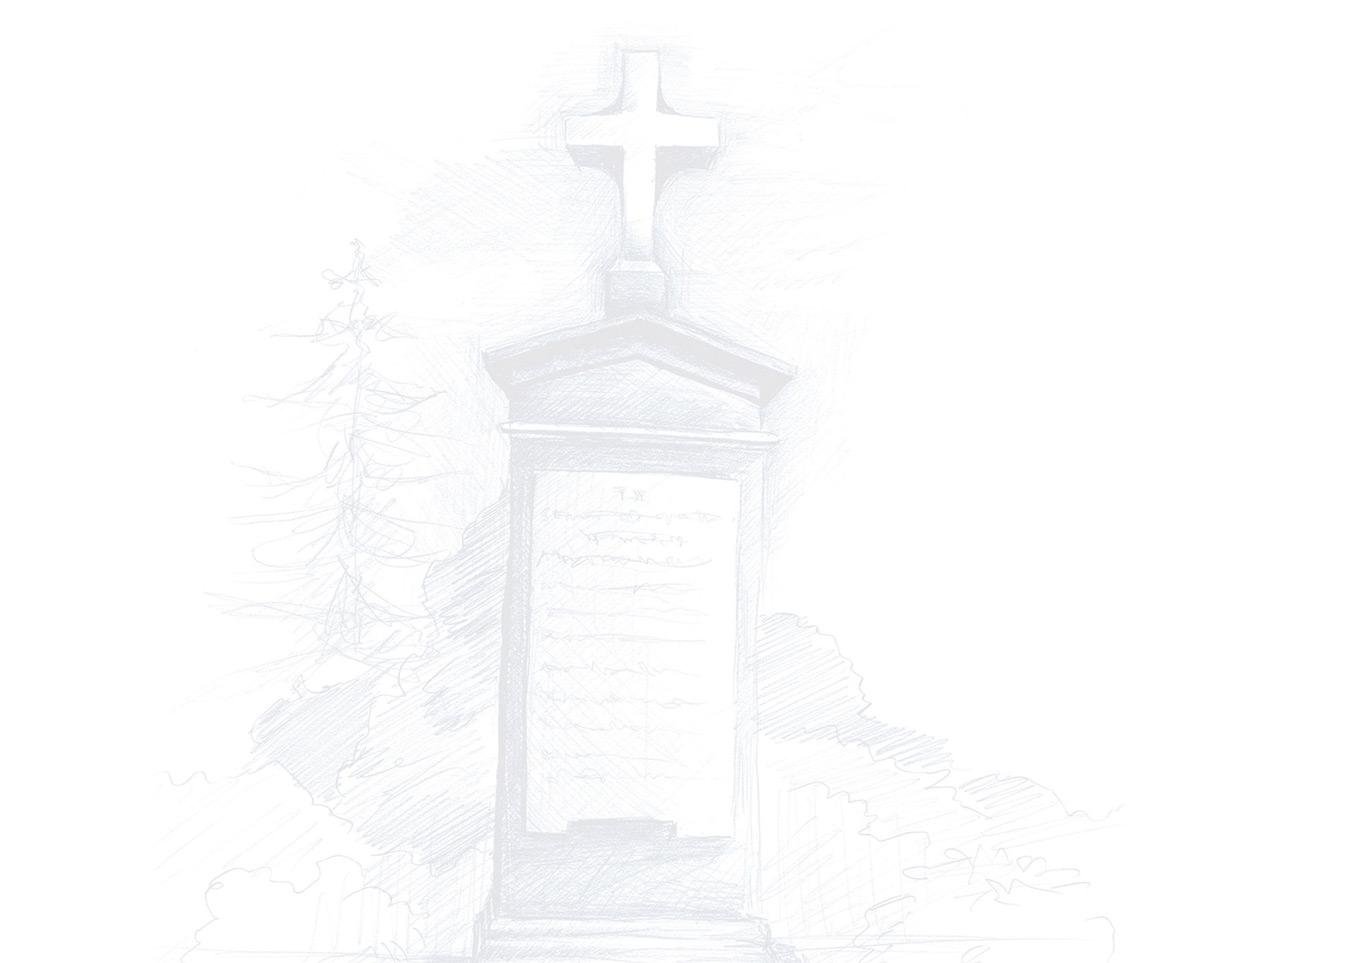 cmentarze-slider2-tlo1-1